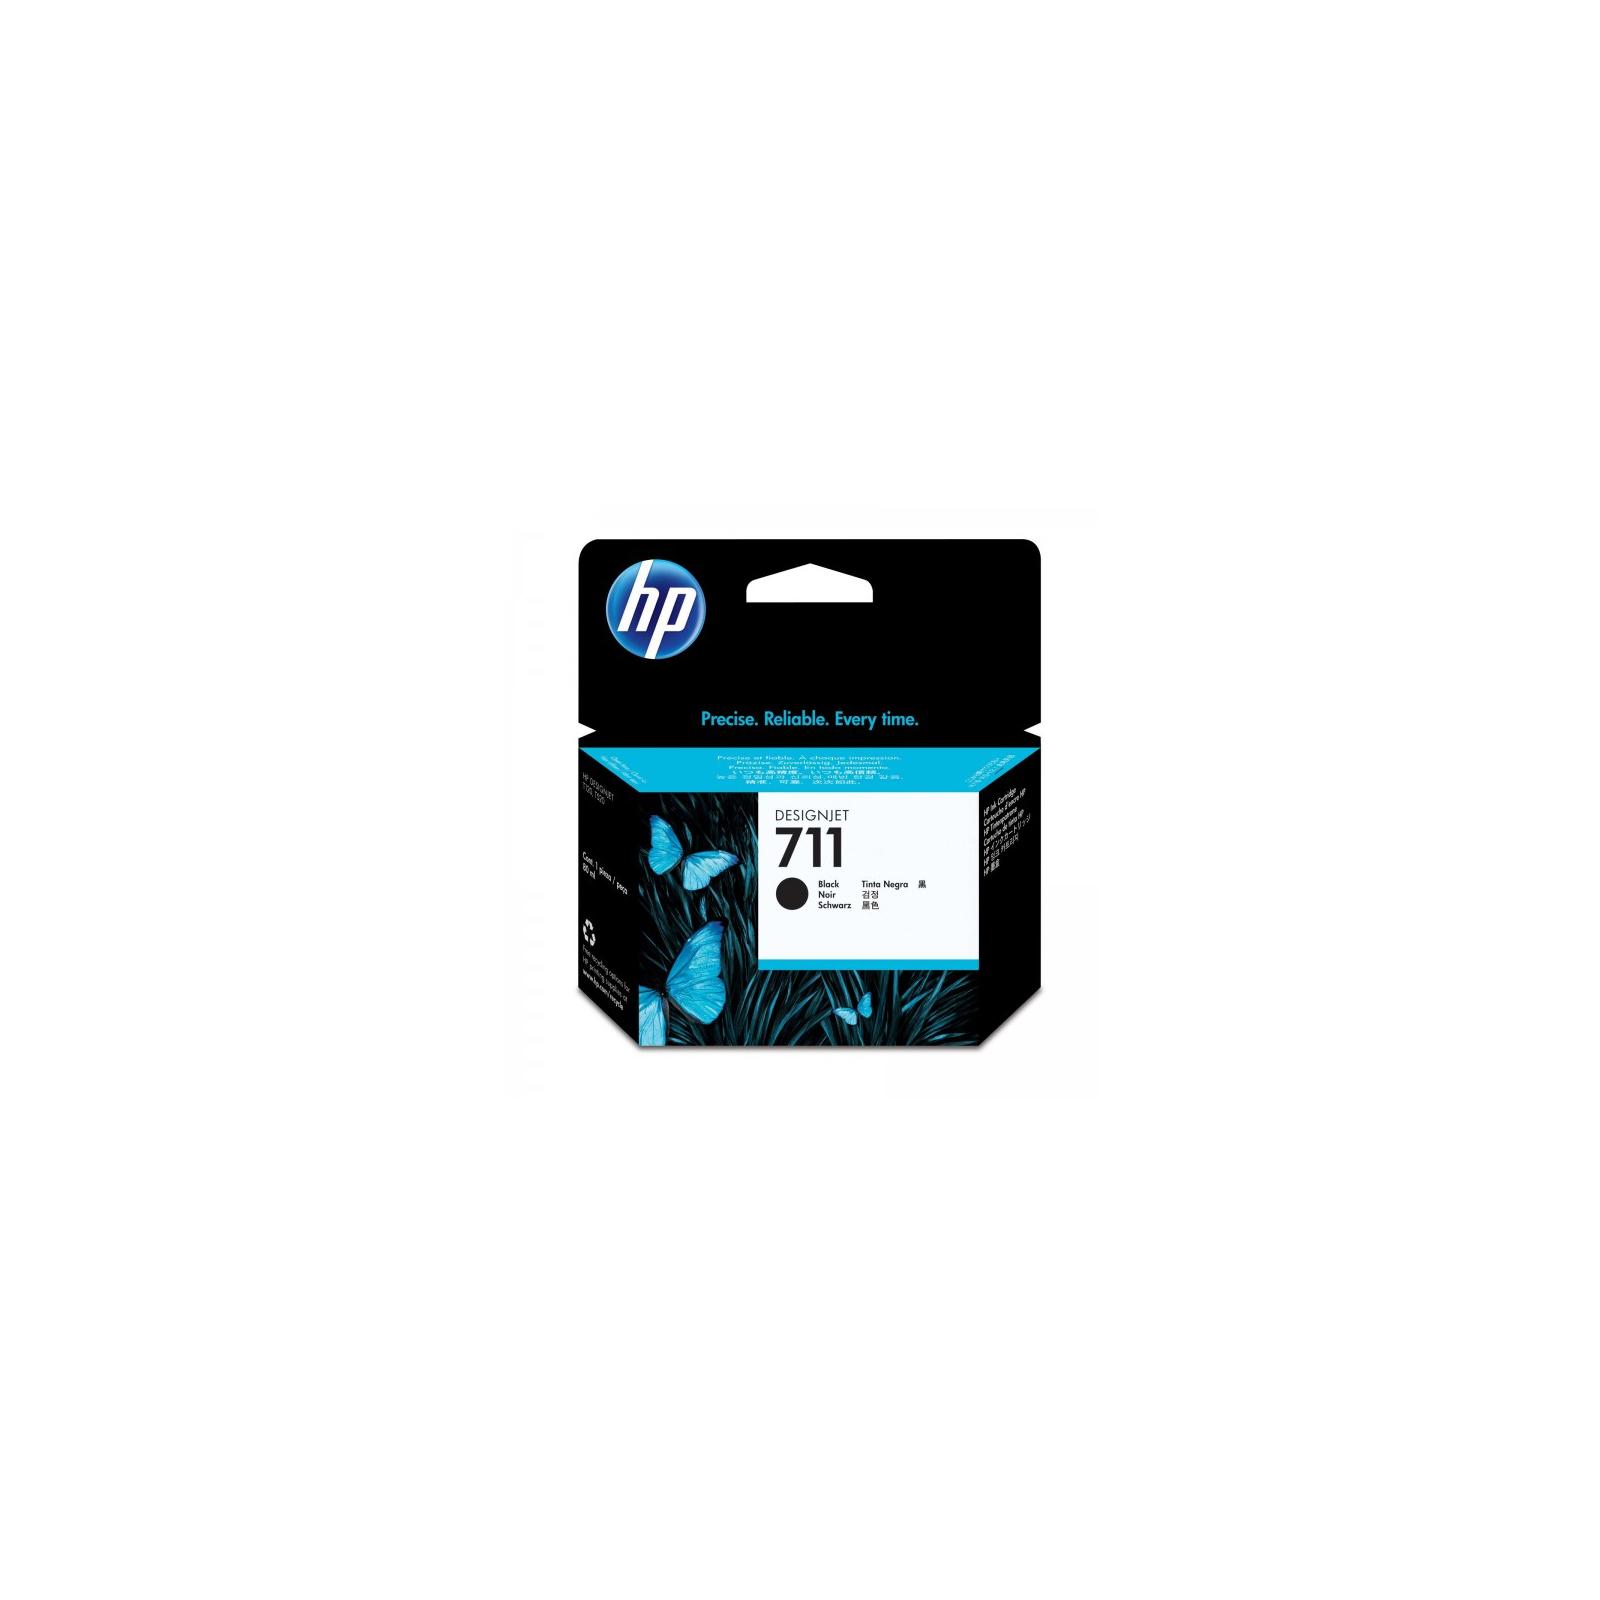 Картридж HP DJ No.711 DesignJet 120/520 Black 80ml (CZ133A)